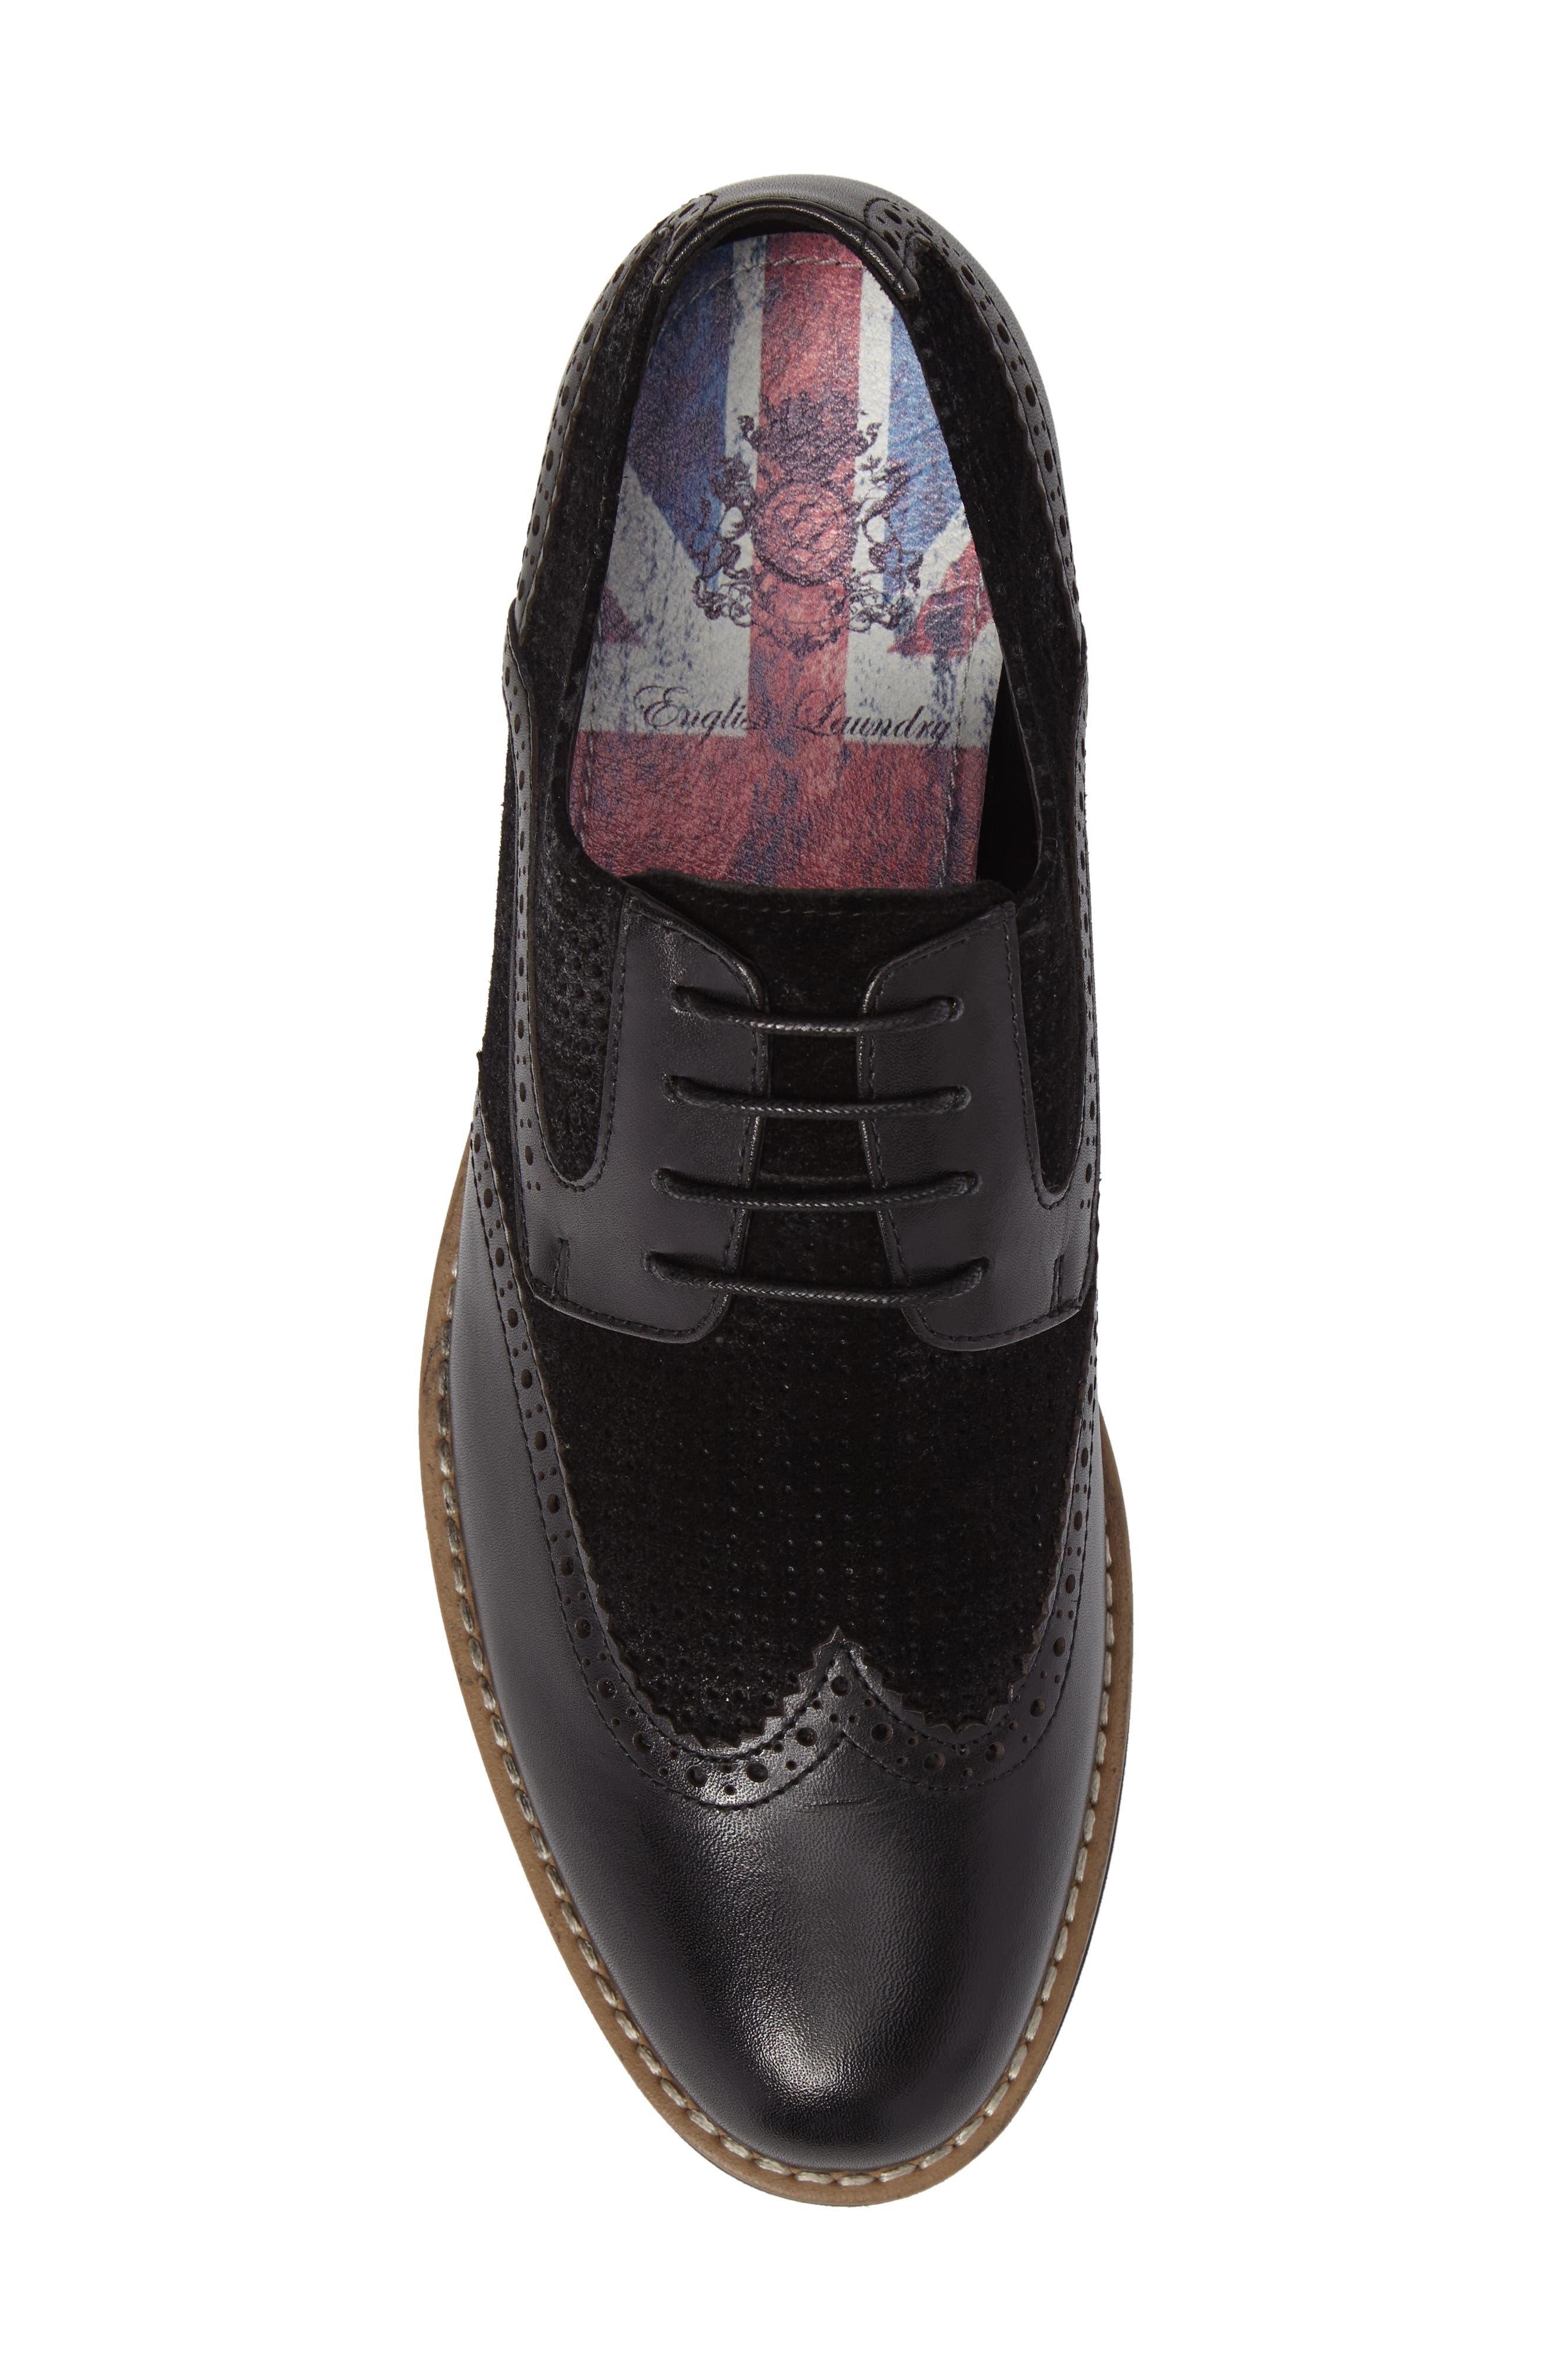 Maritime Spectator Shoe,                             Alternate thumbnail 5, color,                             Black Leather